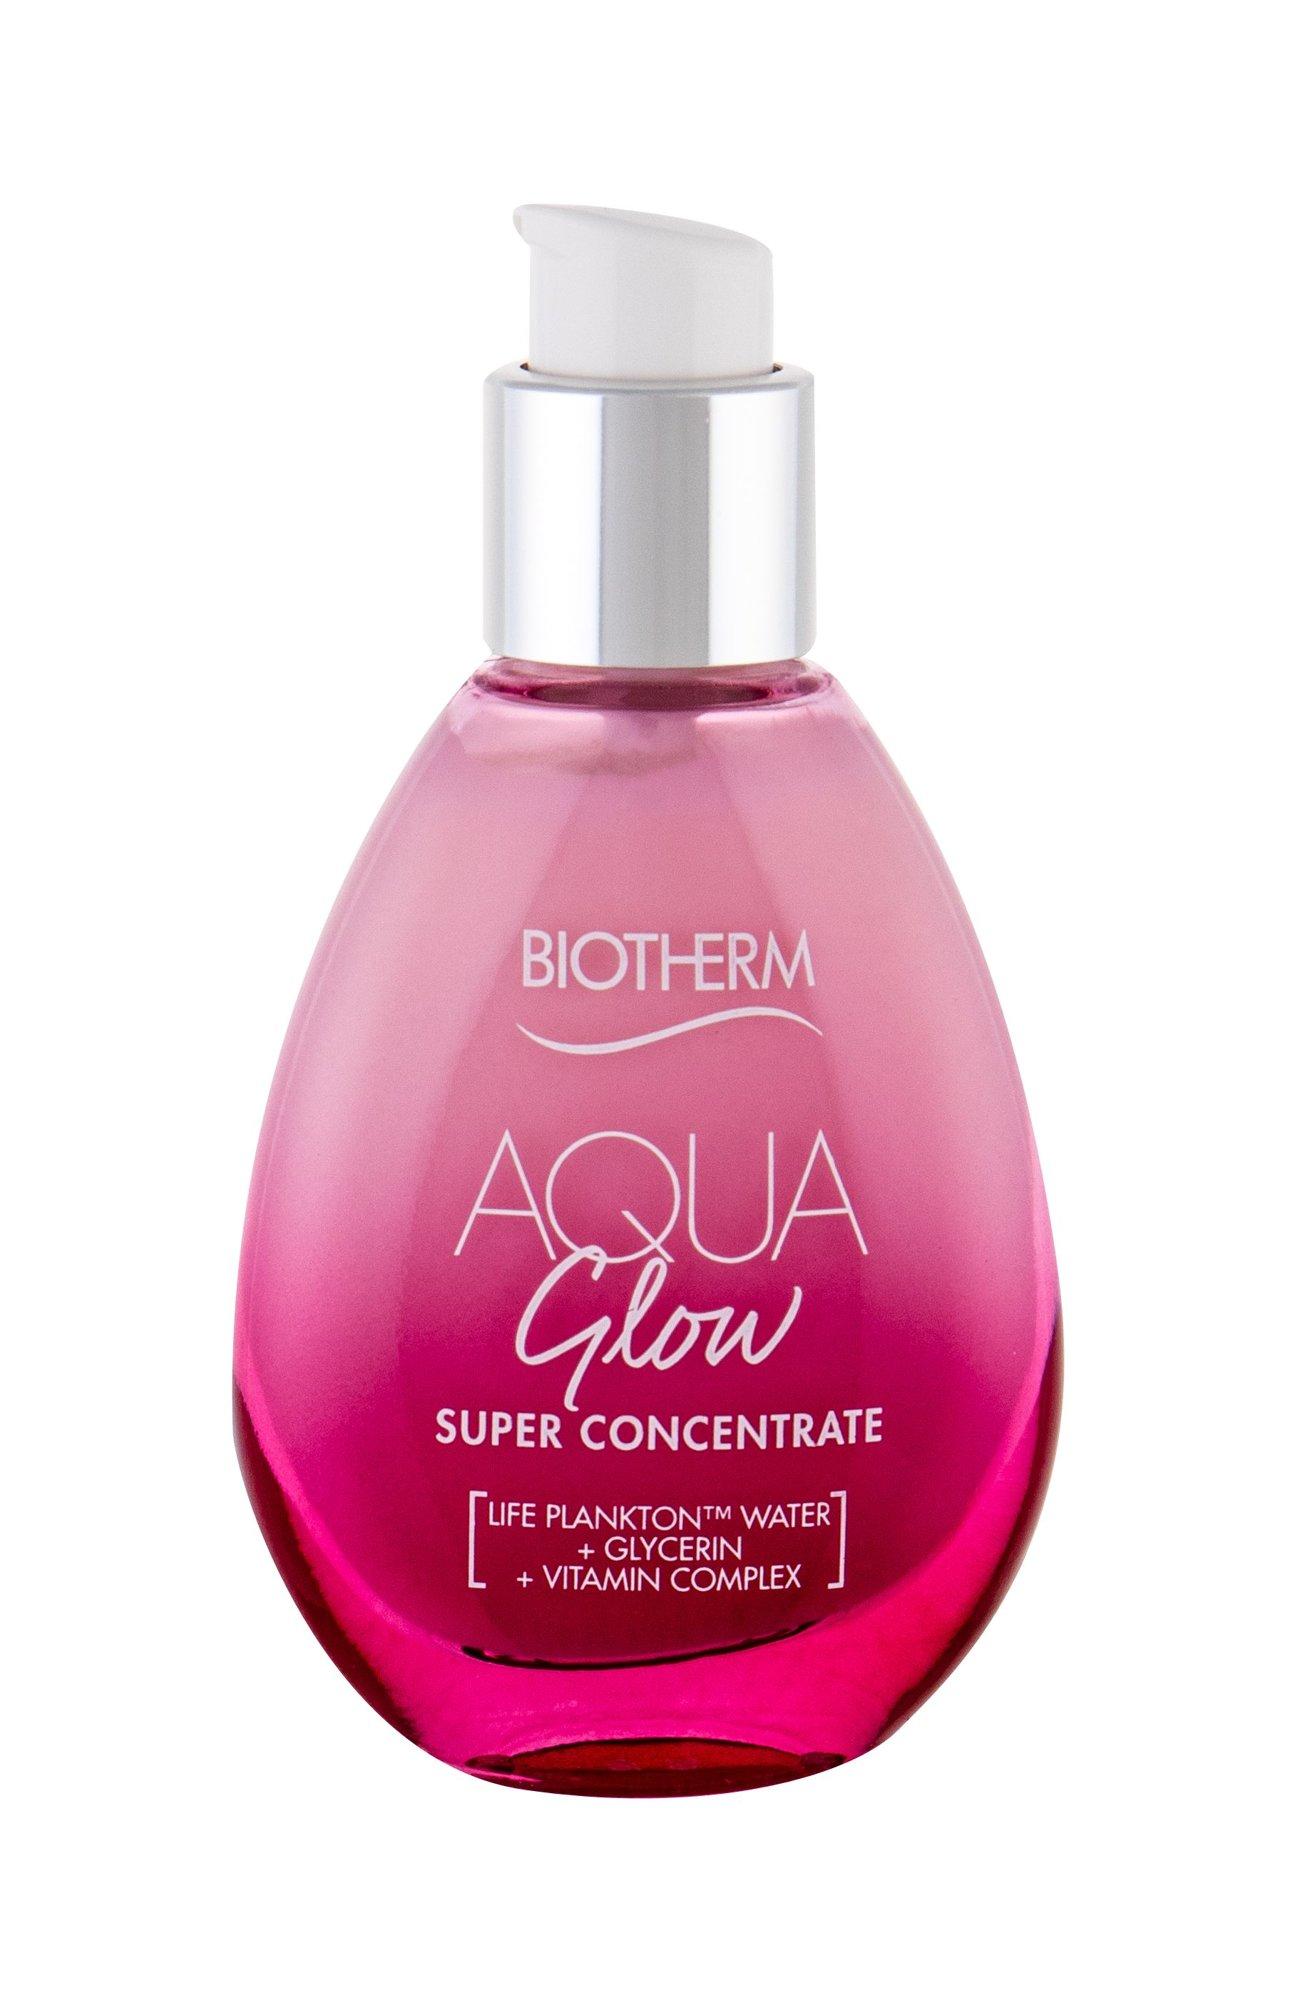 Biotherm Aqua Facial Gel 50ml  Glow